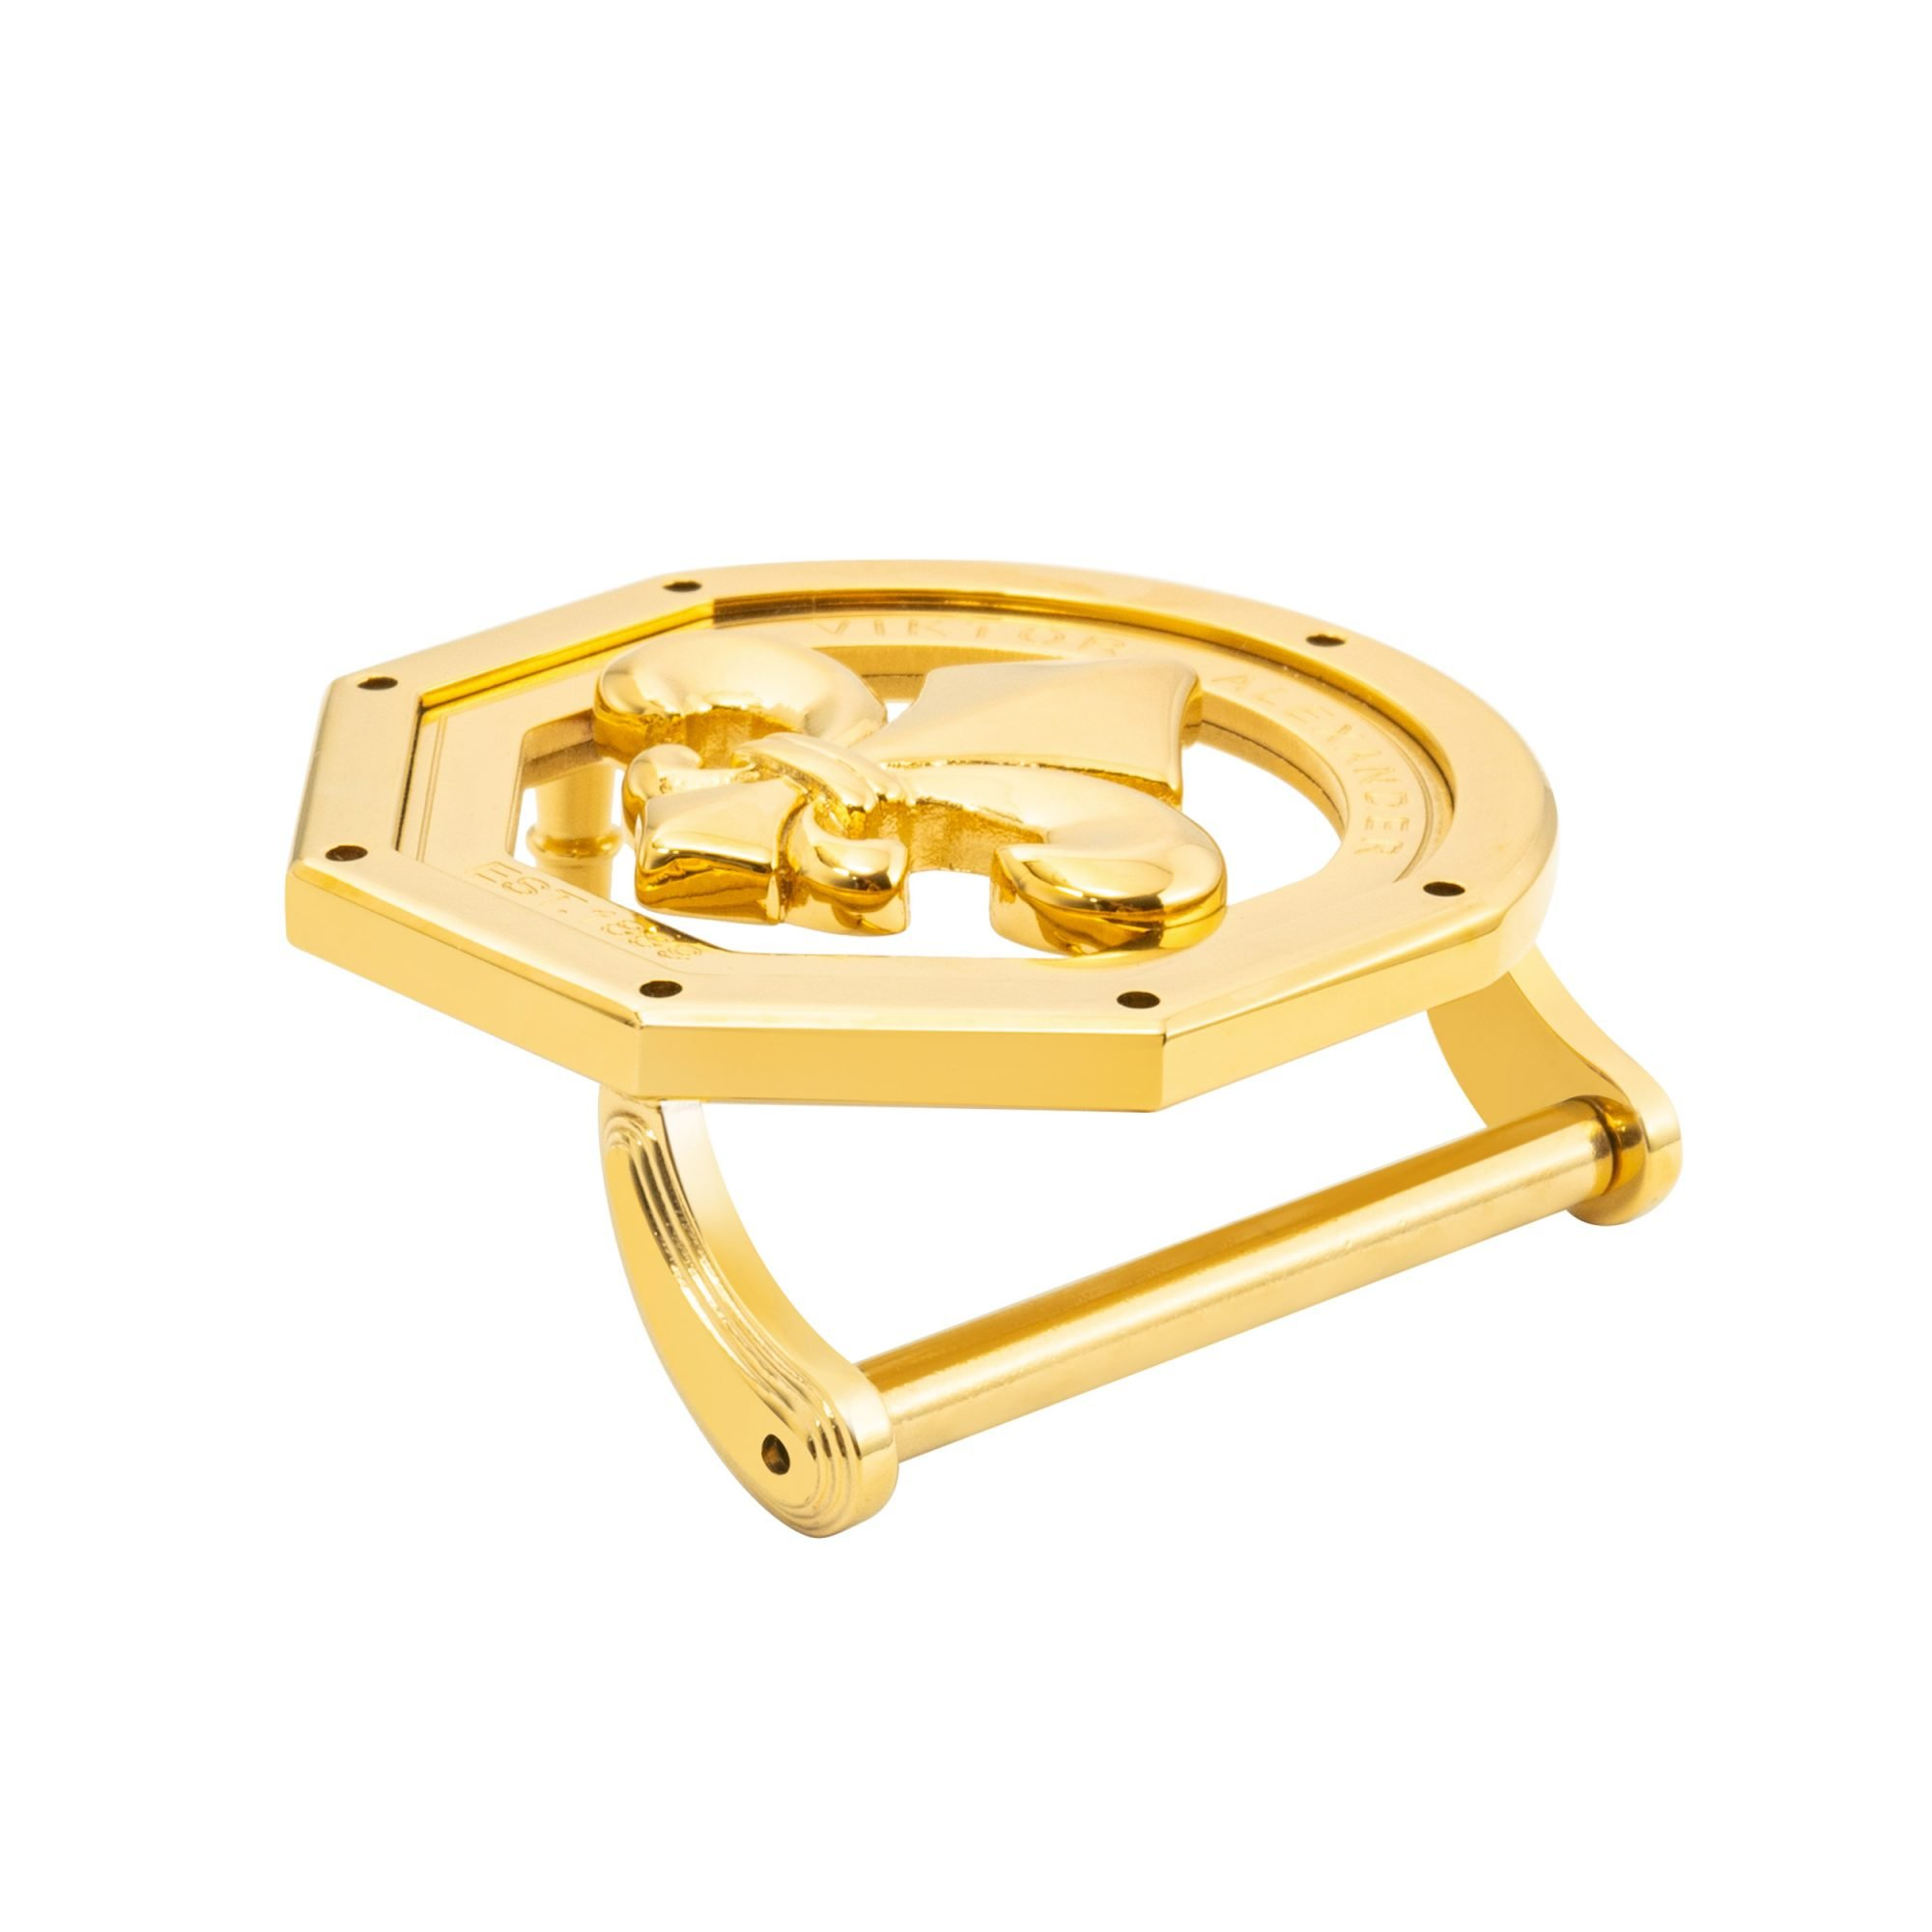 VIKTOR ALEXANDER 38MM STAINLESS STEEL BELT BUCKLE FLEUR DE LIS OFF-SHAPE YELLOW GOLD SIDE PROFILE